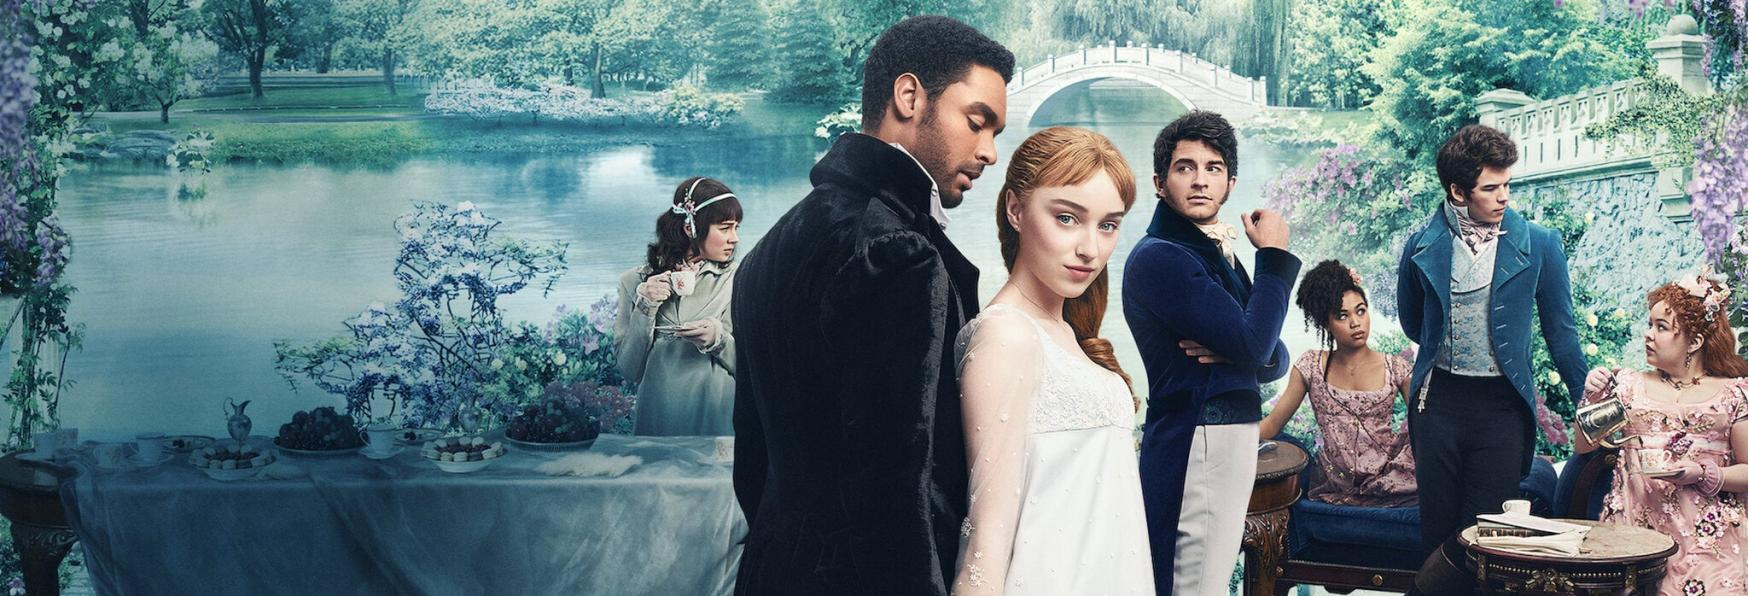 Bridgerton: Netflix Rinnova l'acclamata Serie TV per altre Due Stagioni